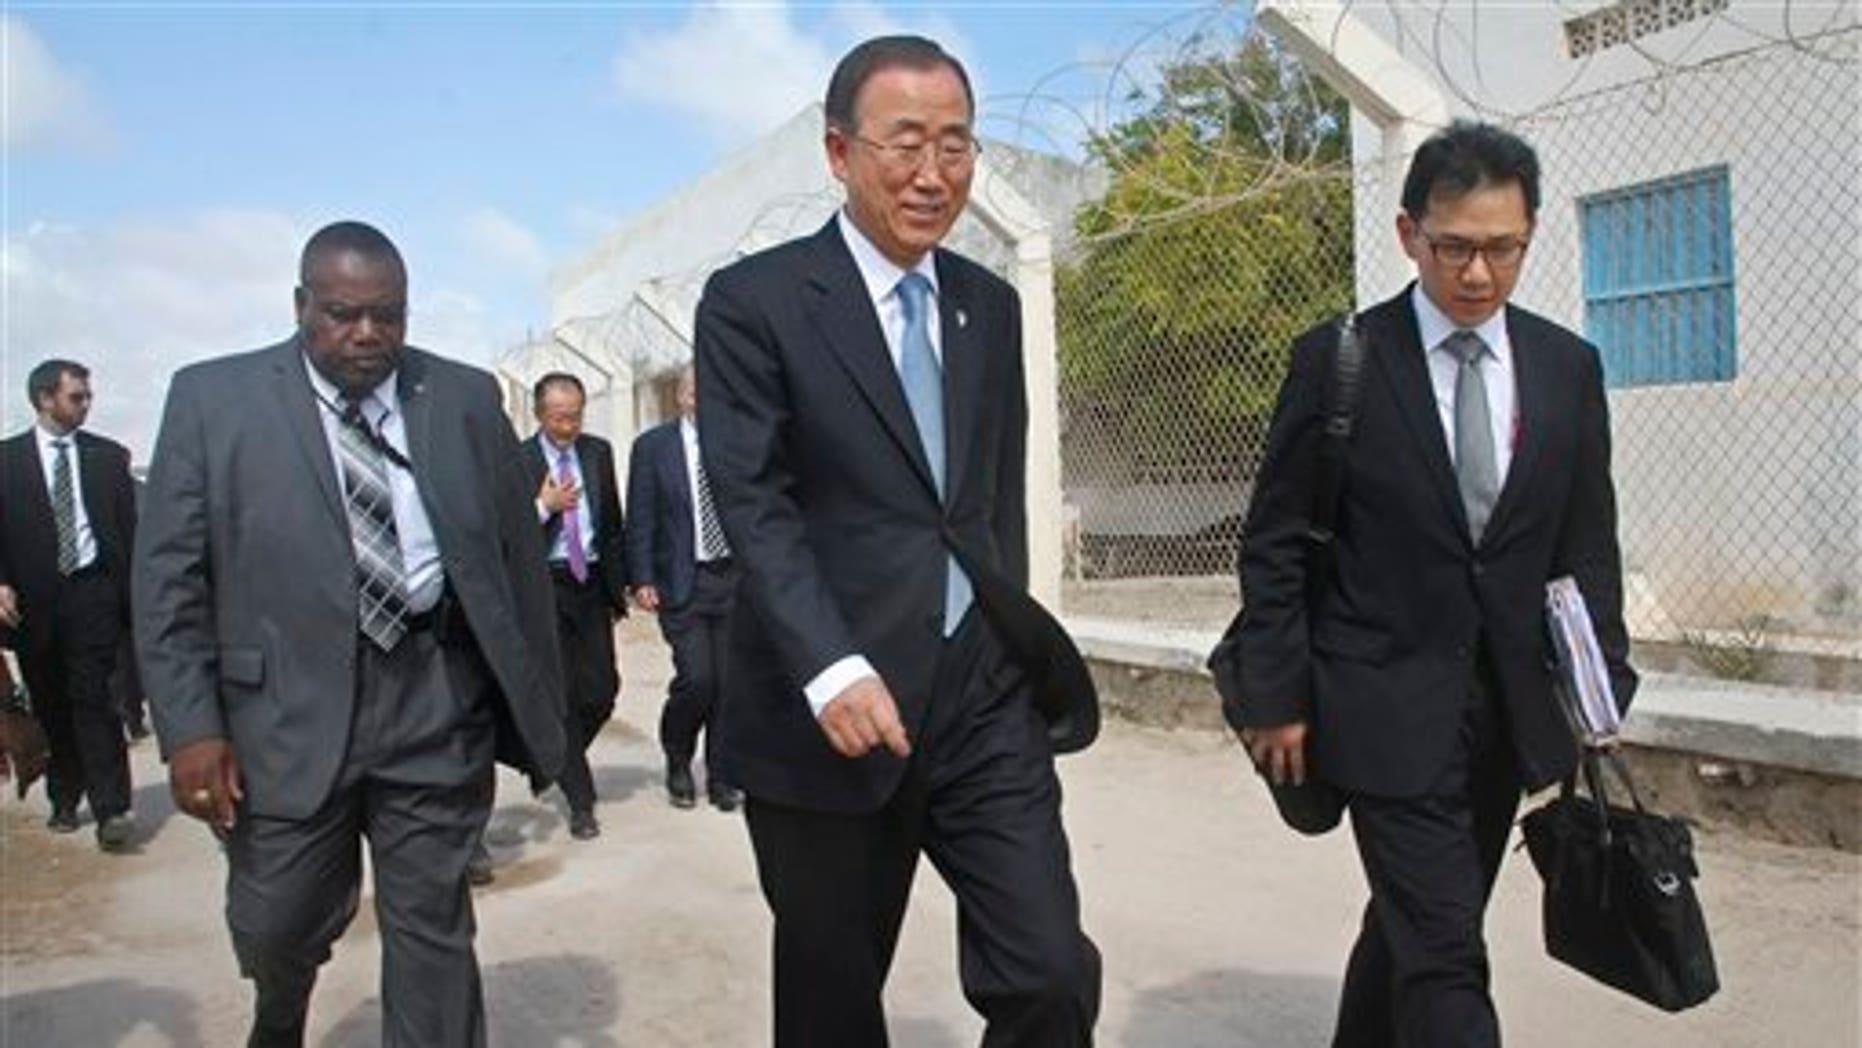 U.N. Secretary General Ban Ki-moon, center, walks inside the heavily-protected airport complex during a visit to Mogadishu, Somalia, Wednesday, Oct. 29, 2014.  (AP Photo/Farah Abdi Warsameh)